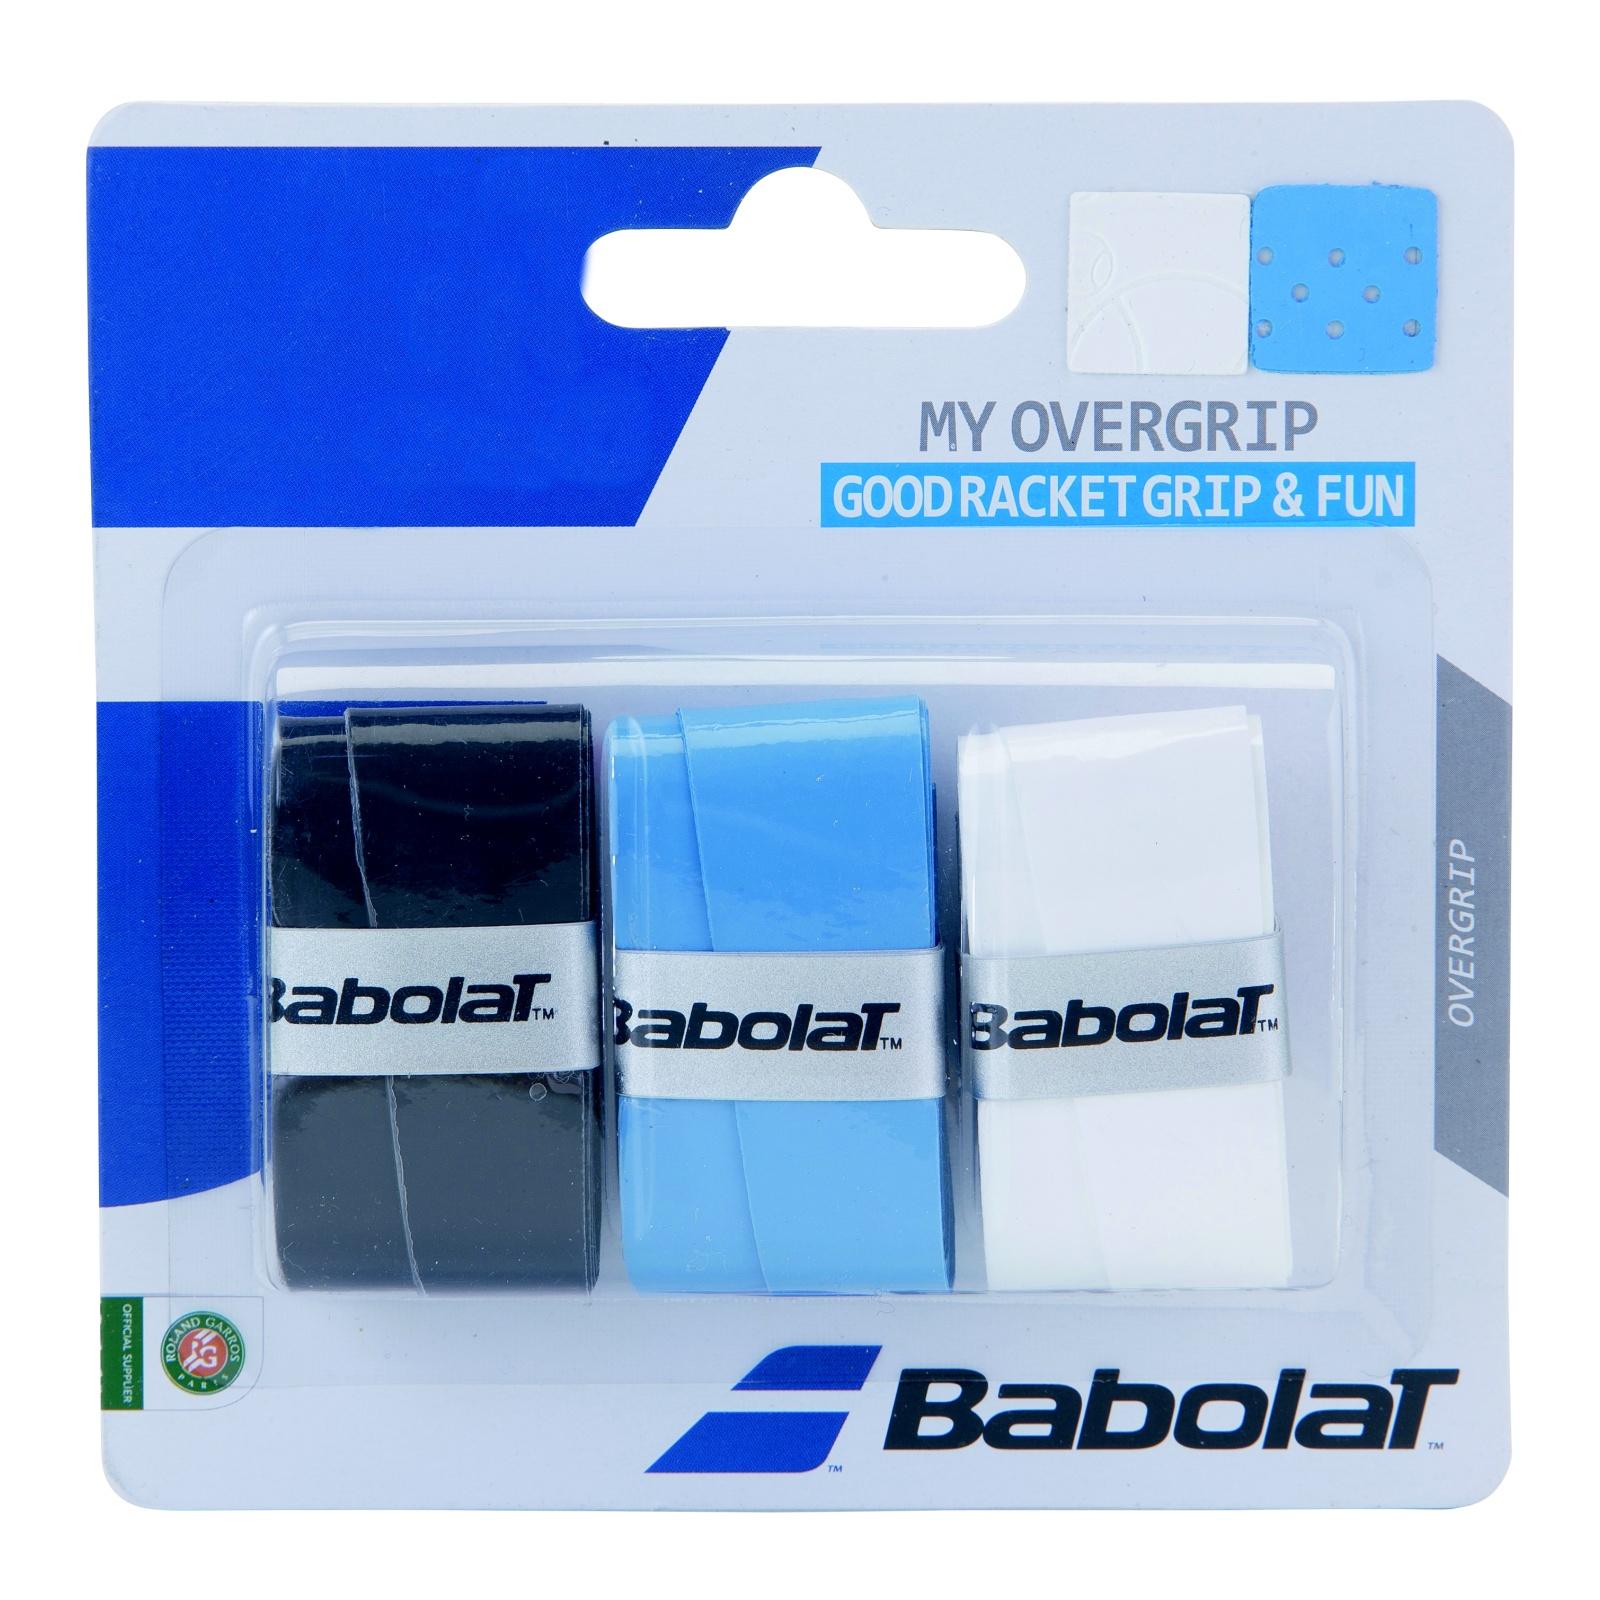 Tenisová omotávka BABOLAT My Overgrip bílá/modrá/černá